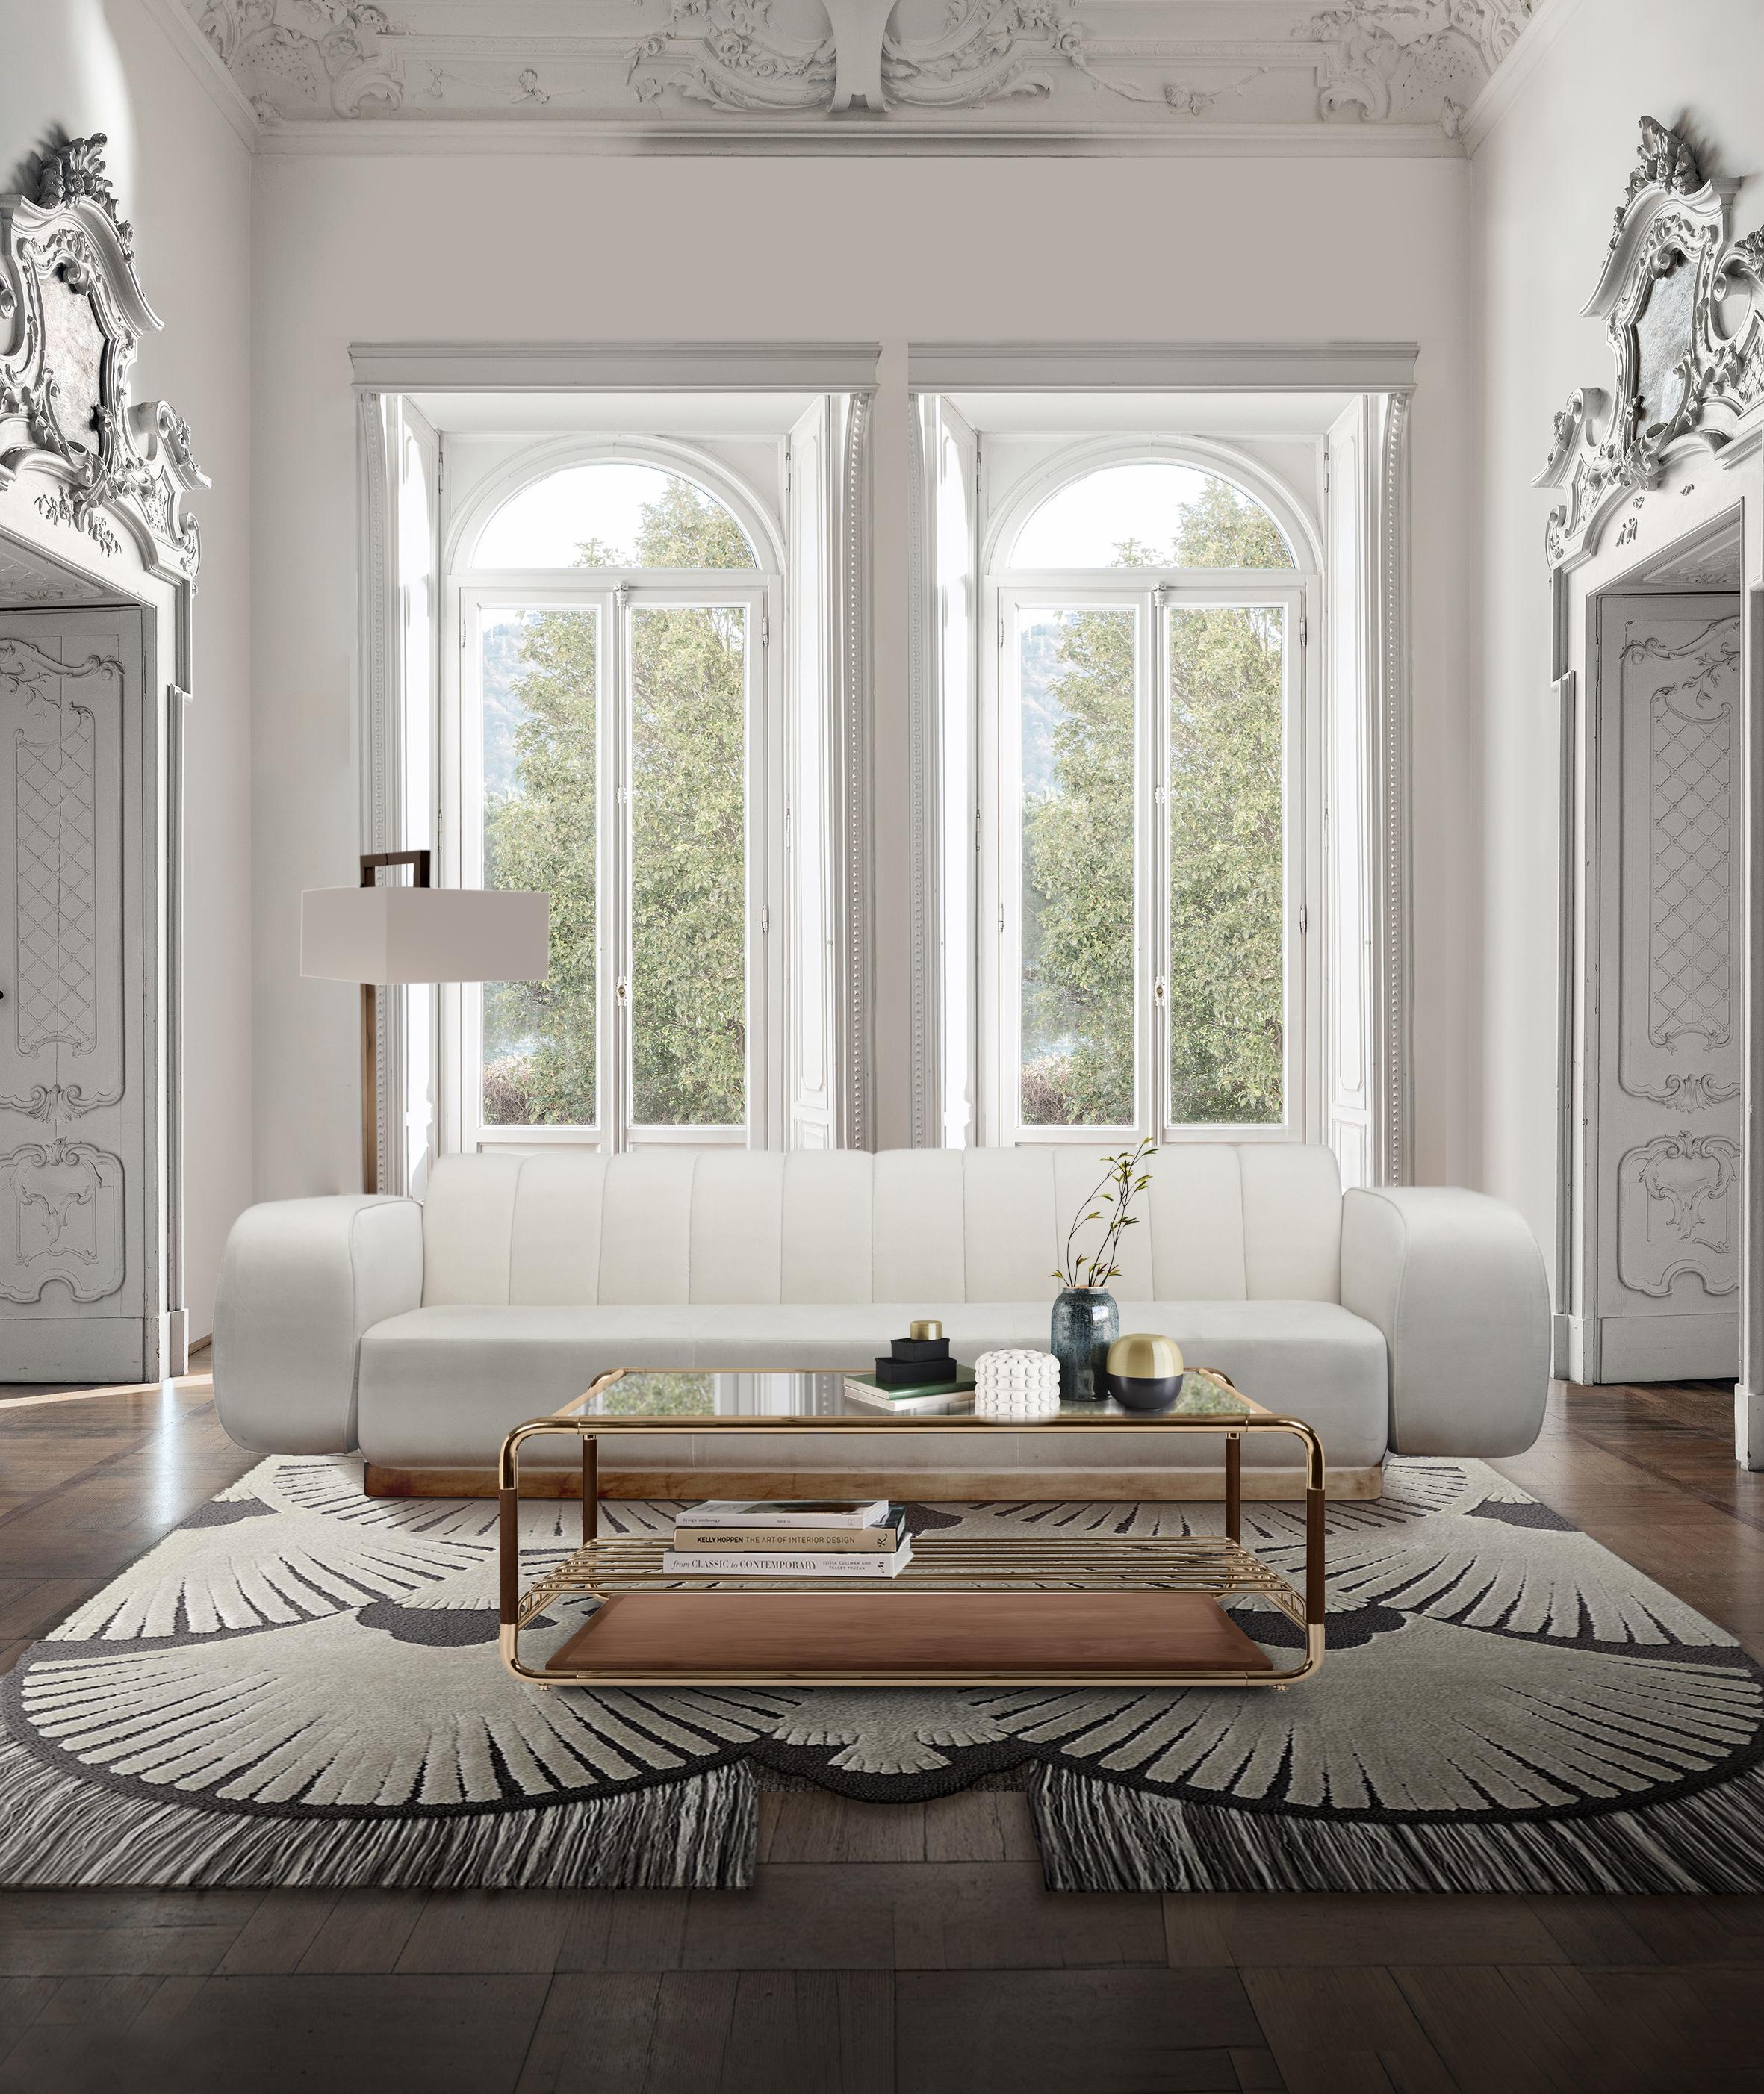 Room by Room Luxury Decor Ideas